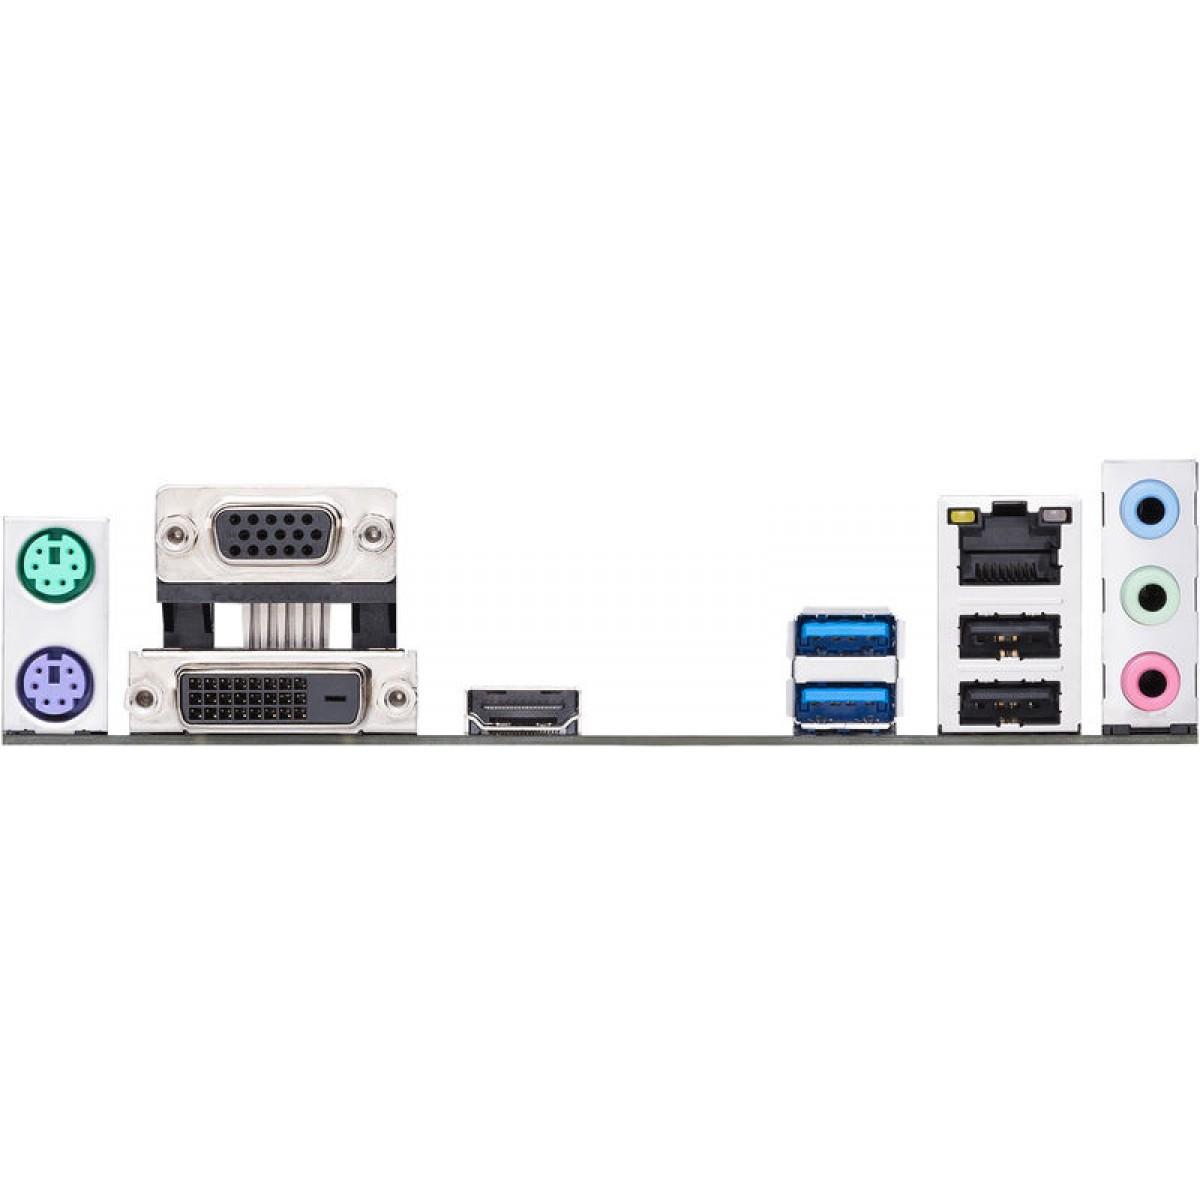 Placa Mãe Asus Prime H410m-A, Chipset H410, Intel LGA 1200, mATX, DDR4